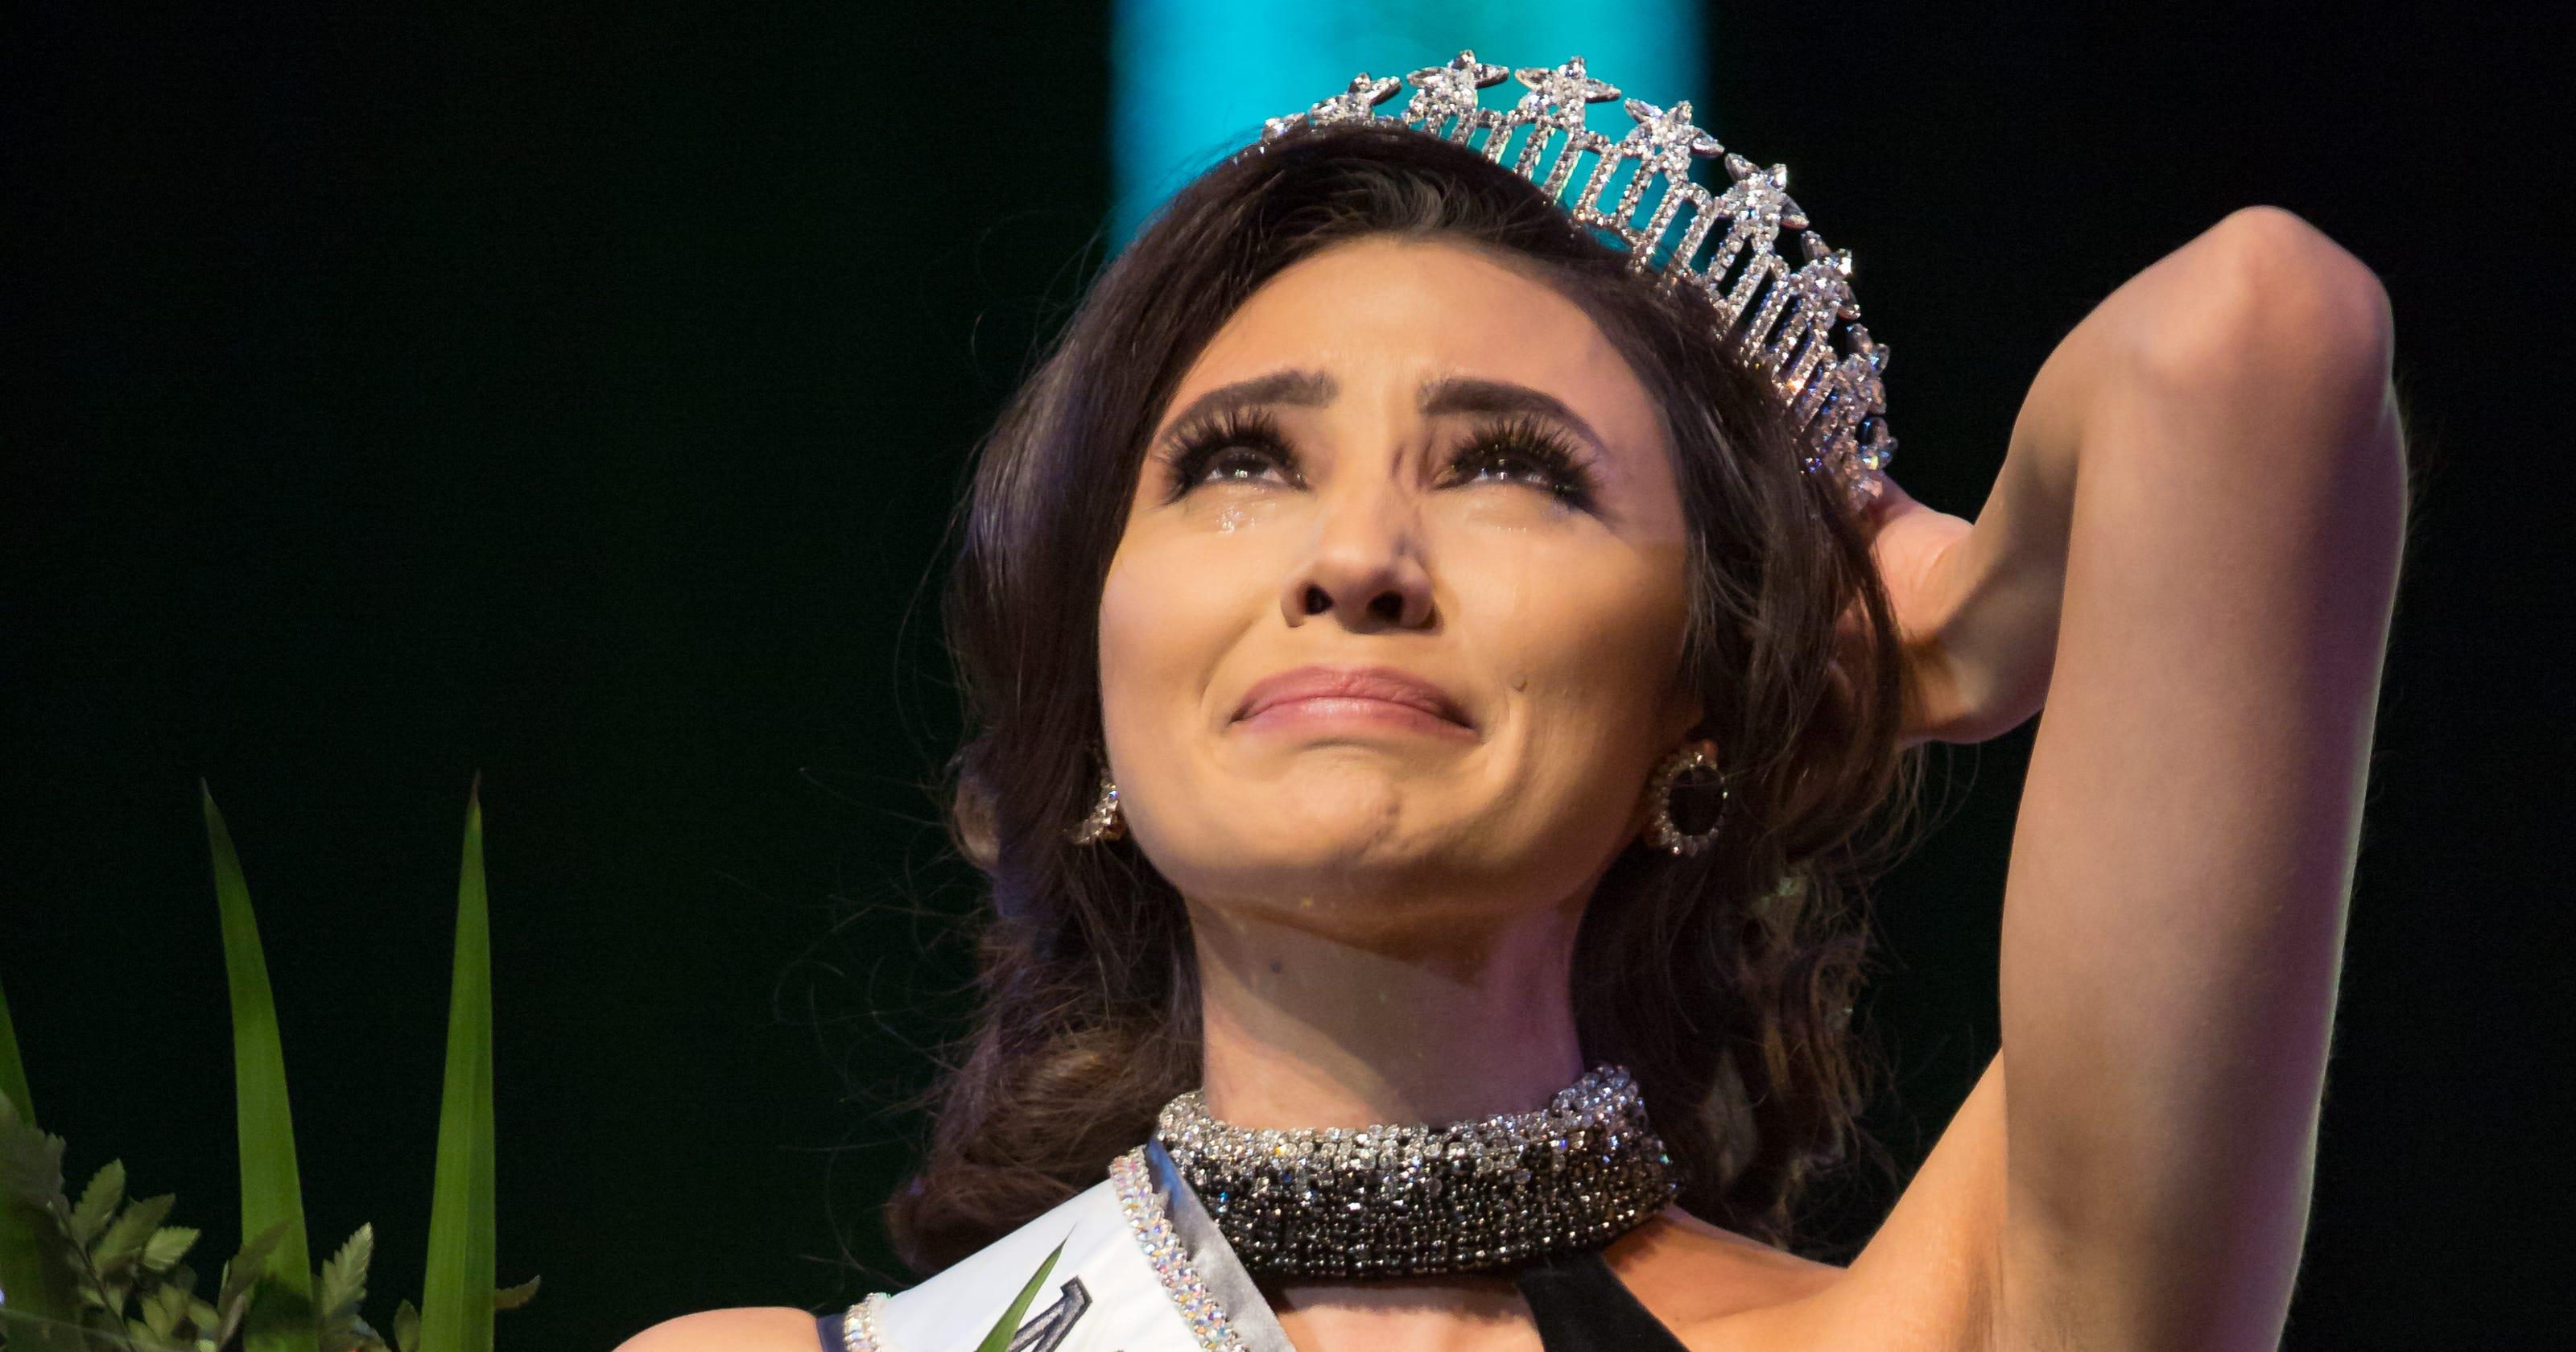 Las Cruces engineer Kristen Leyva wins Miss NM USA